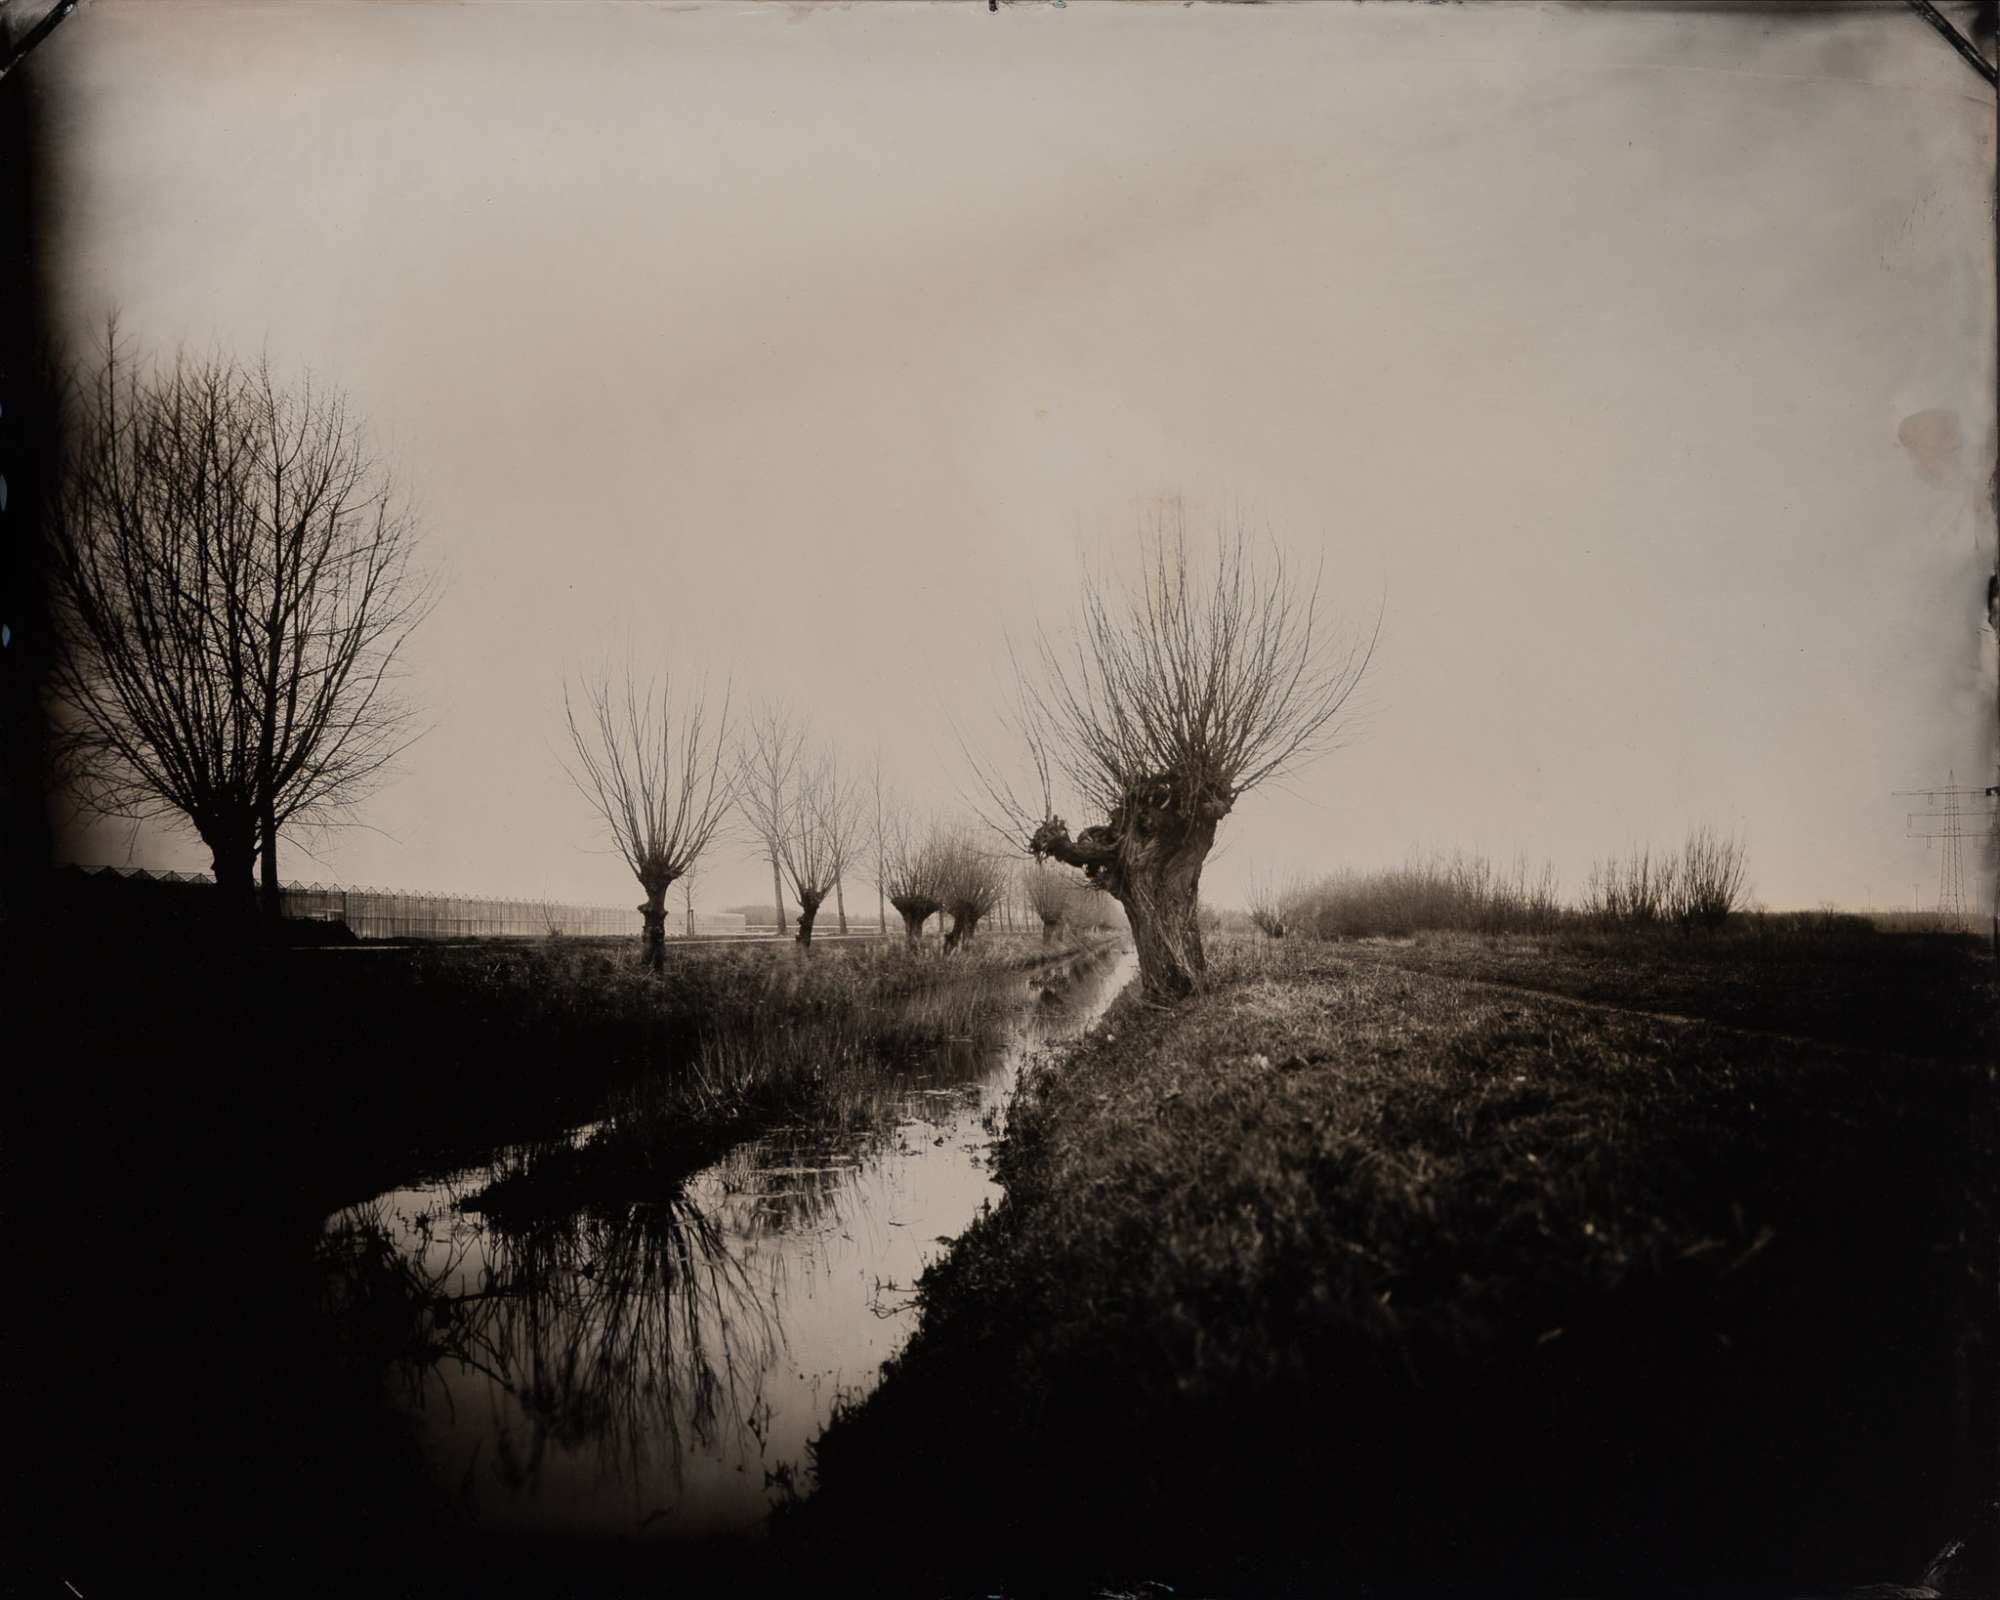 Landscape with Path and Pollard Willows, Etten-Leur, 2020